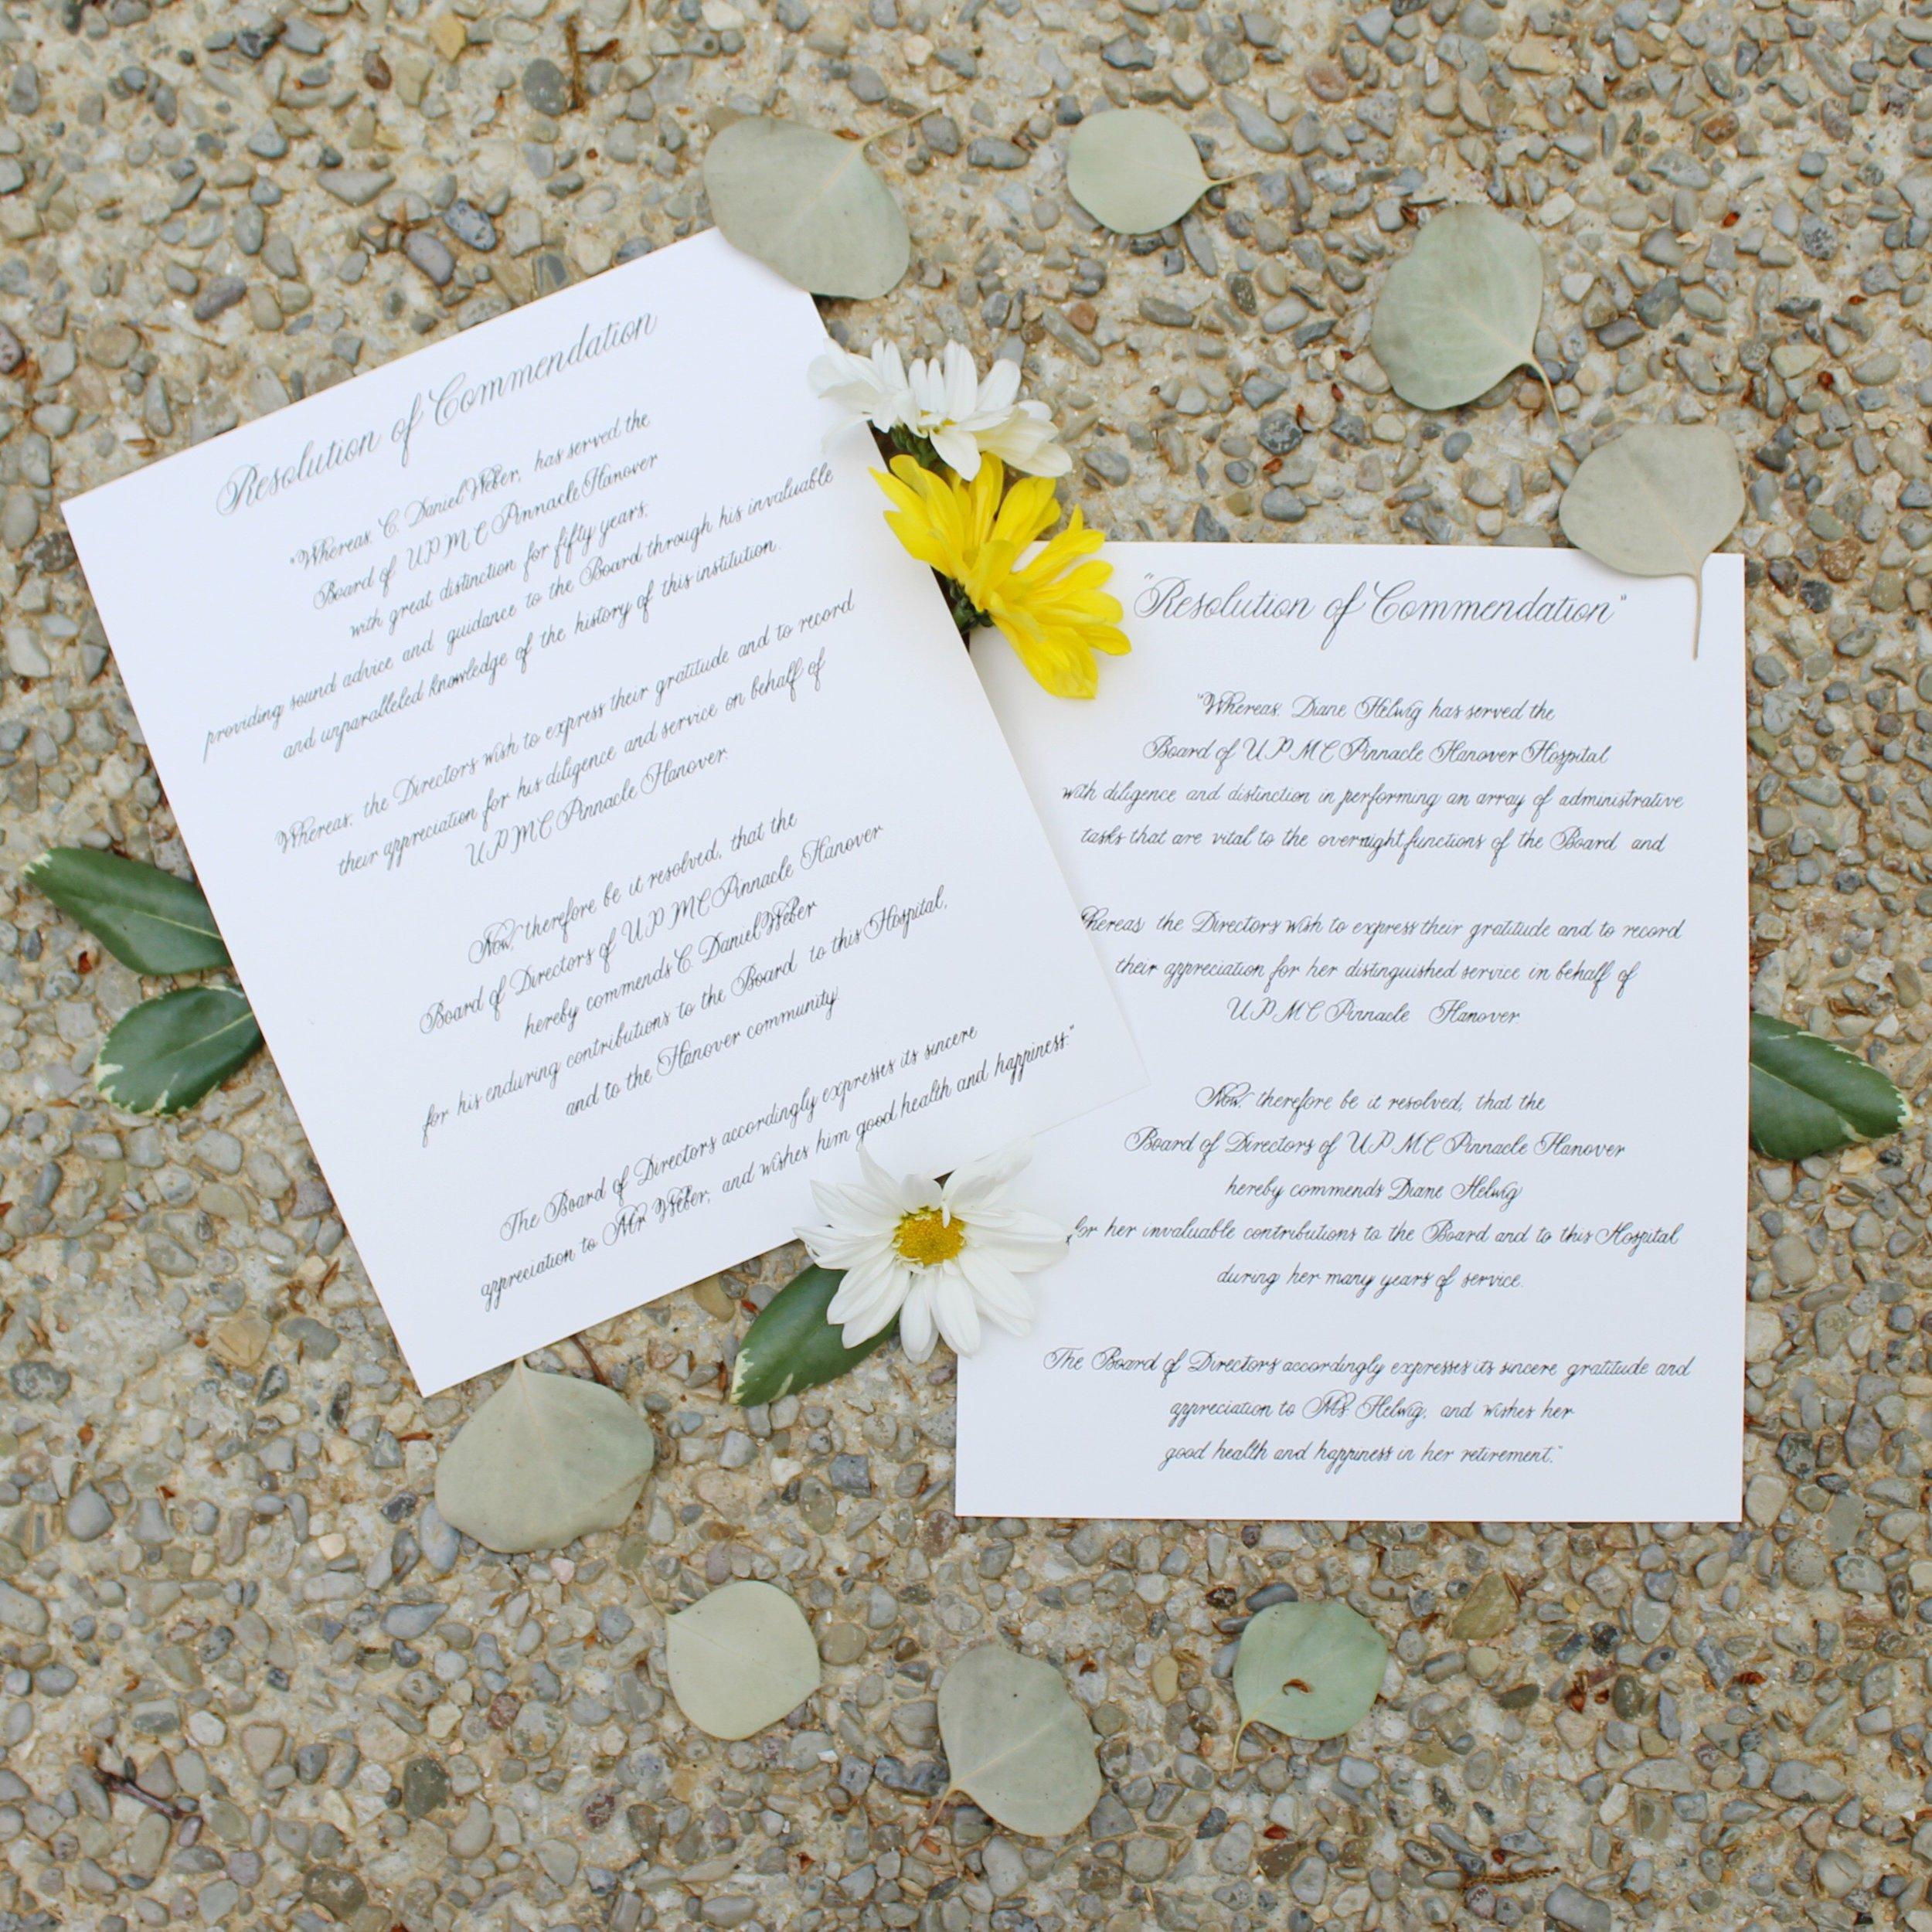 Central PA, York PA, JesSmith Designs, custom, wedding, invitations, bridal, announcements, save the date, baby, hanover, calligraphy, baltimore, wedding invitations, lancaster, gettysburg-05-10 17.14.24.jpg